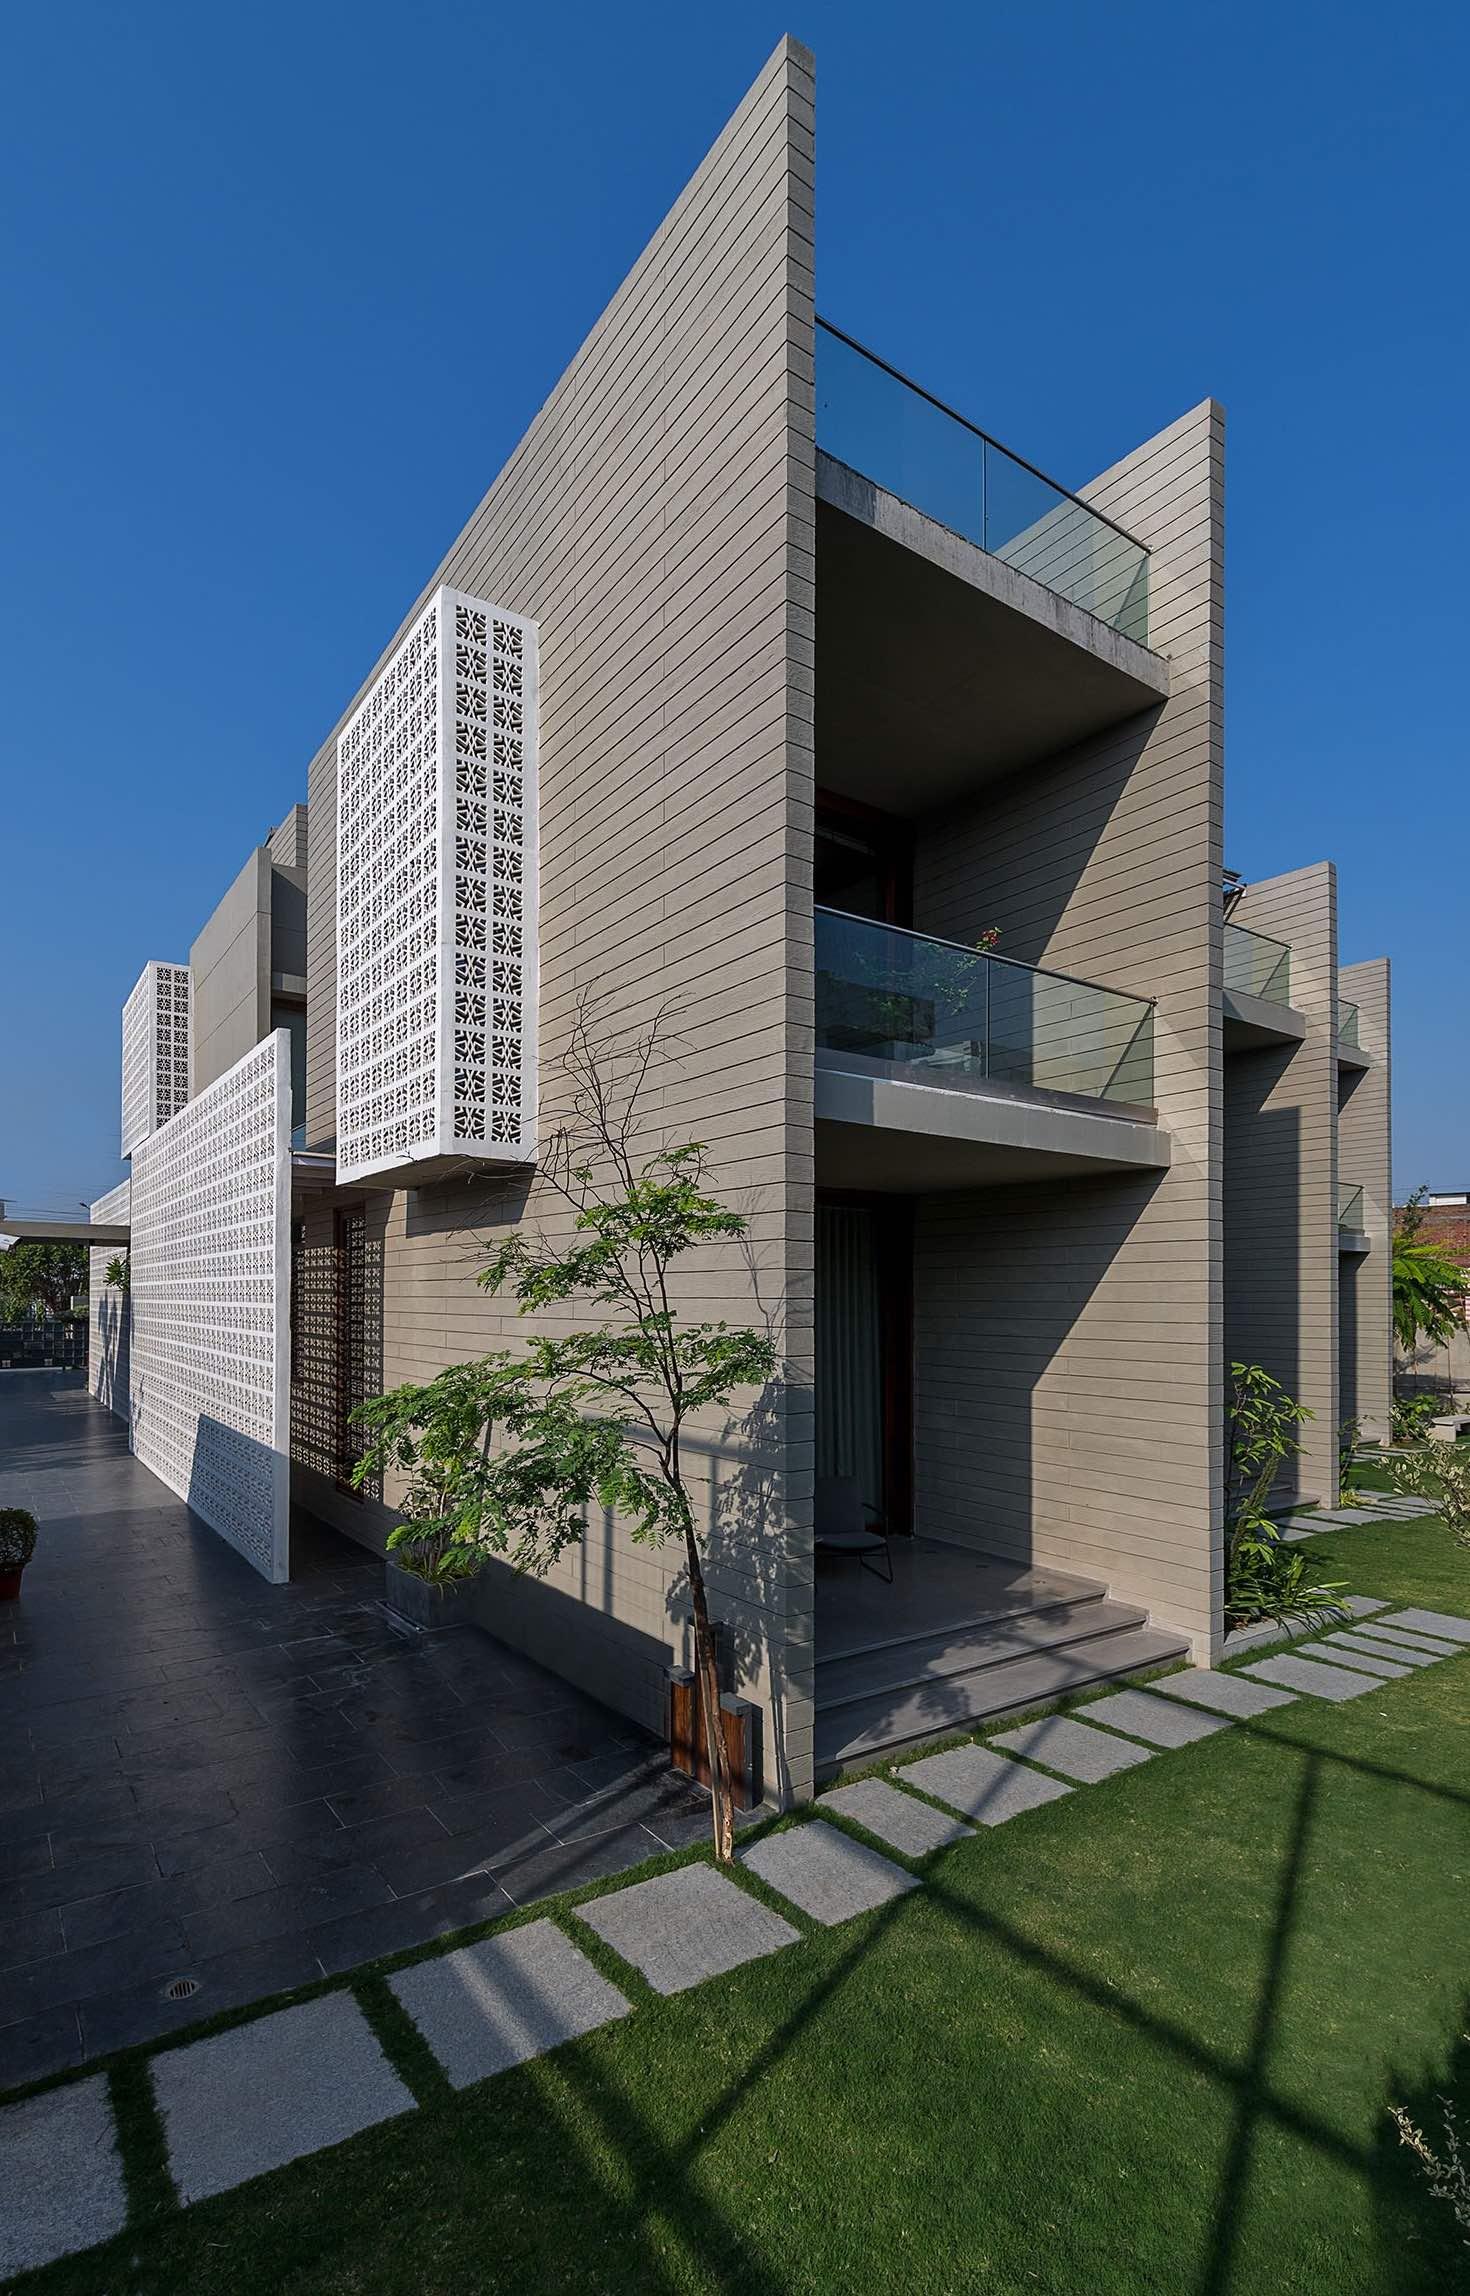 18_Screens_Sanjay_Puri_architects_india_amazingarchitecture_004.jpg